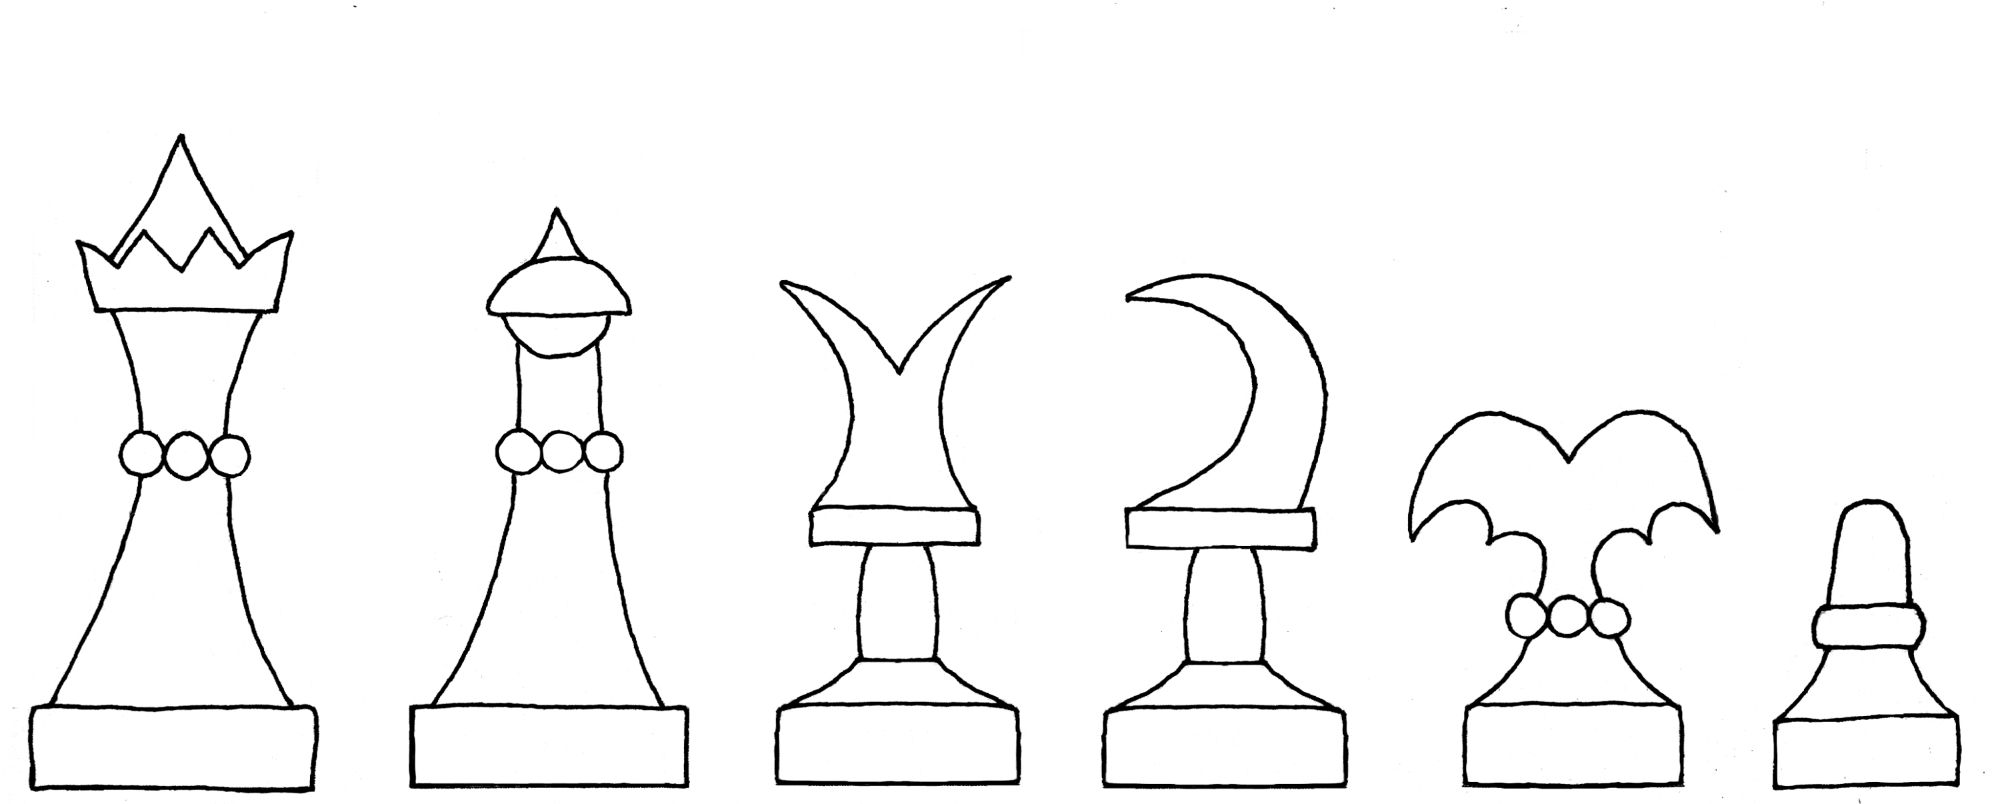 Ammenhausen's Schachzabelbuch chess set  interpretive diagram